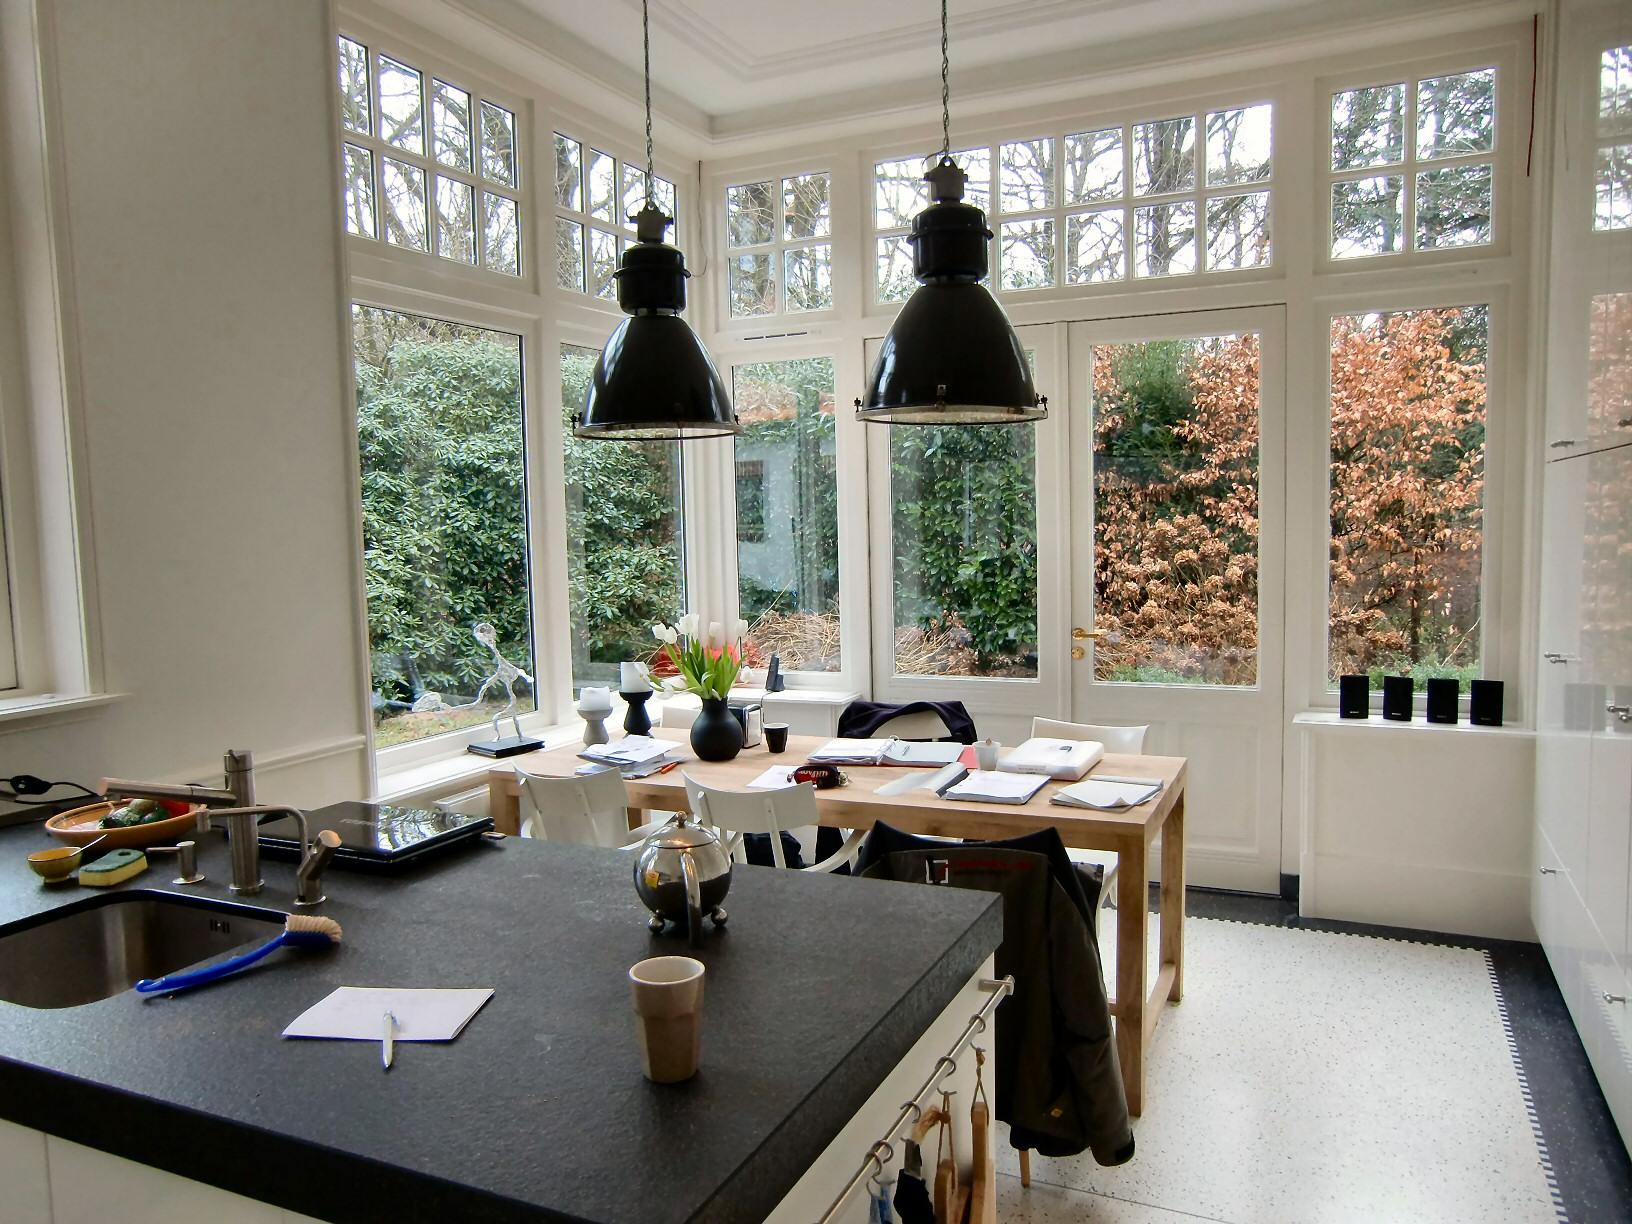 Uitbreiding Aan Huis : Driebergen uitbreiding en verbouwing monumentaal woonhuis